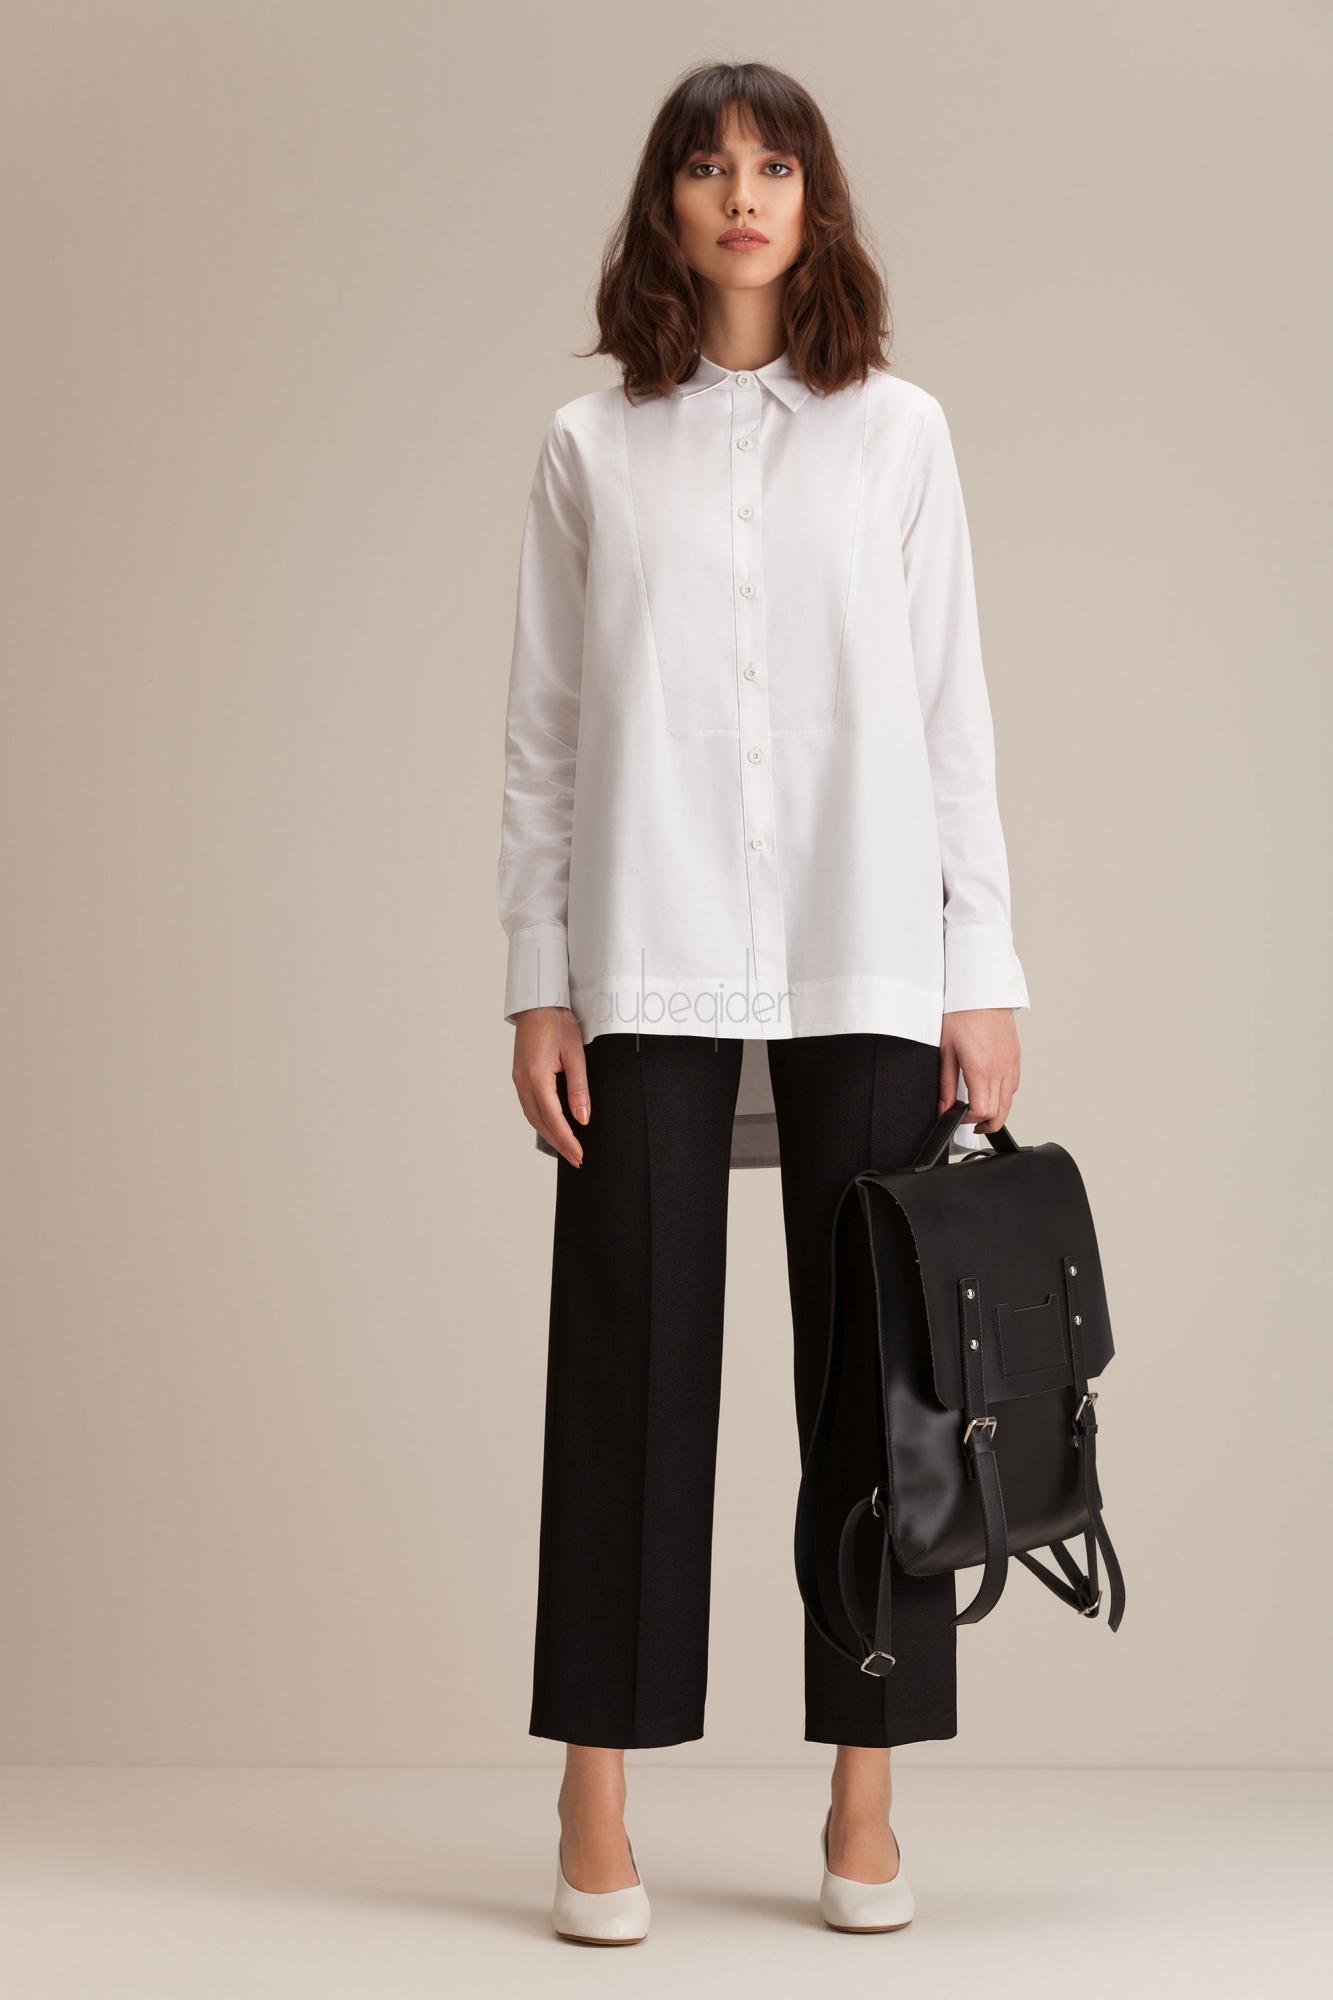 Kuaybe Gider - Siyah Miroir Pantolon